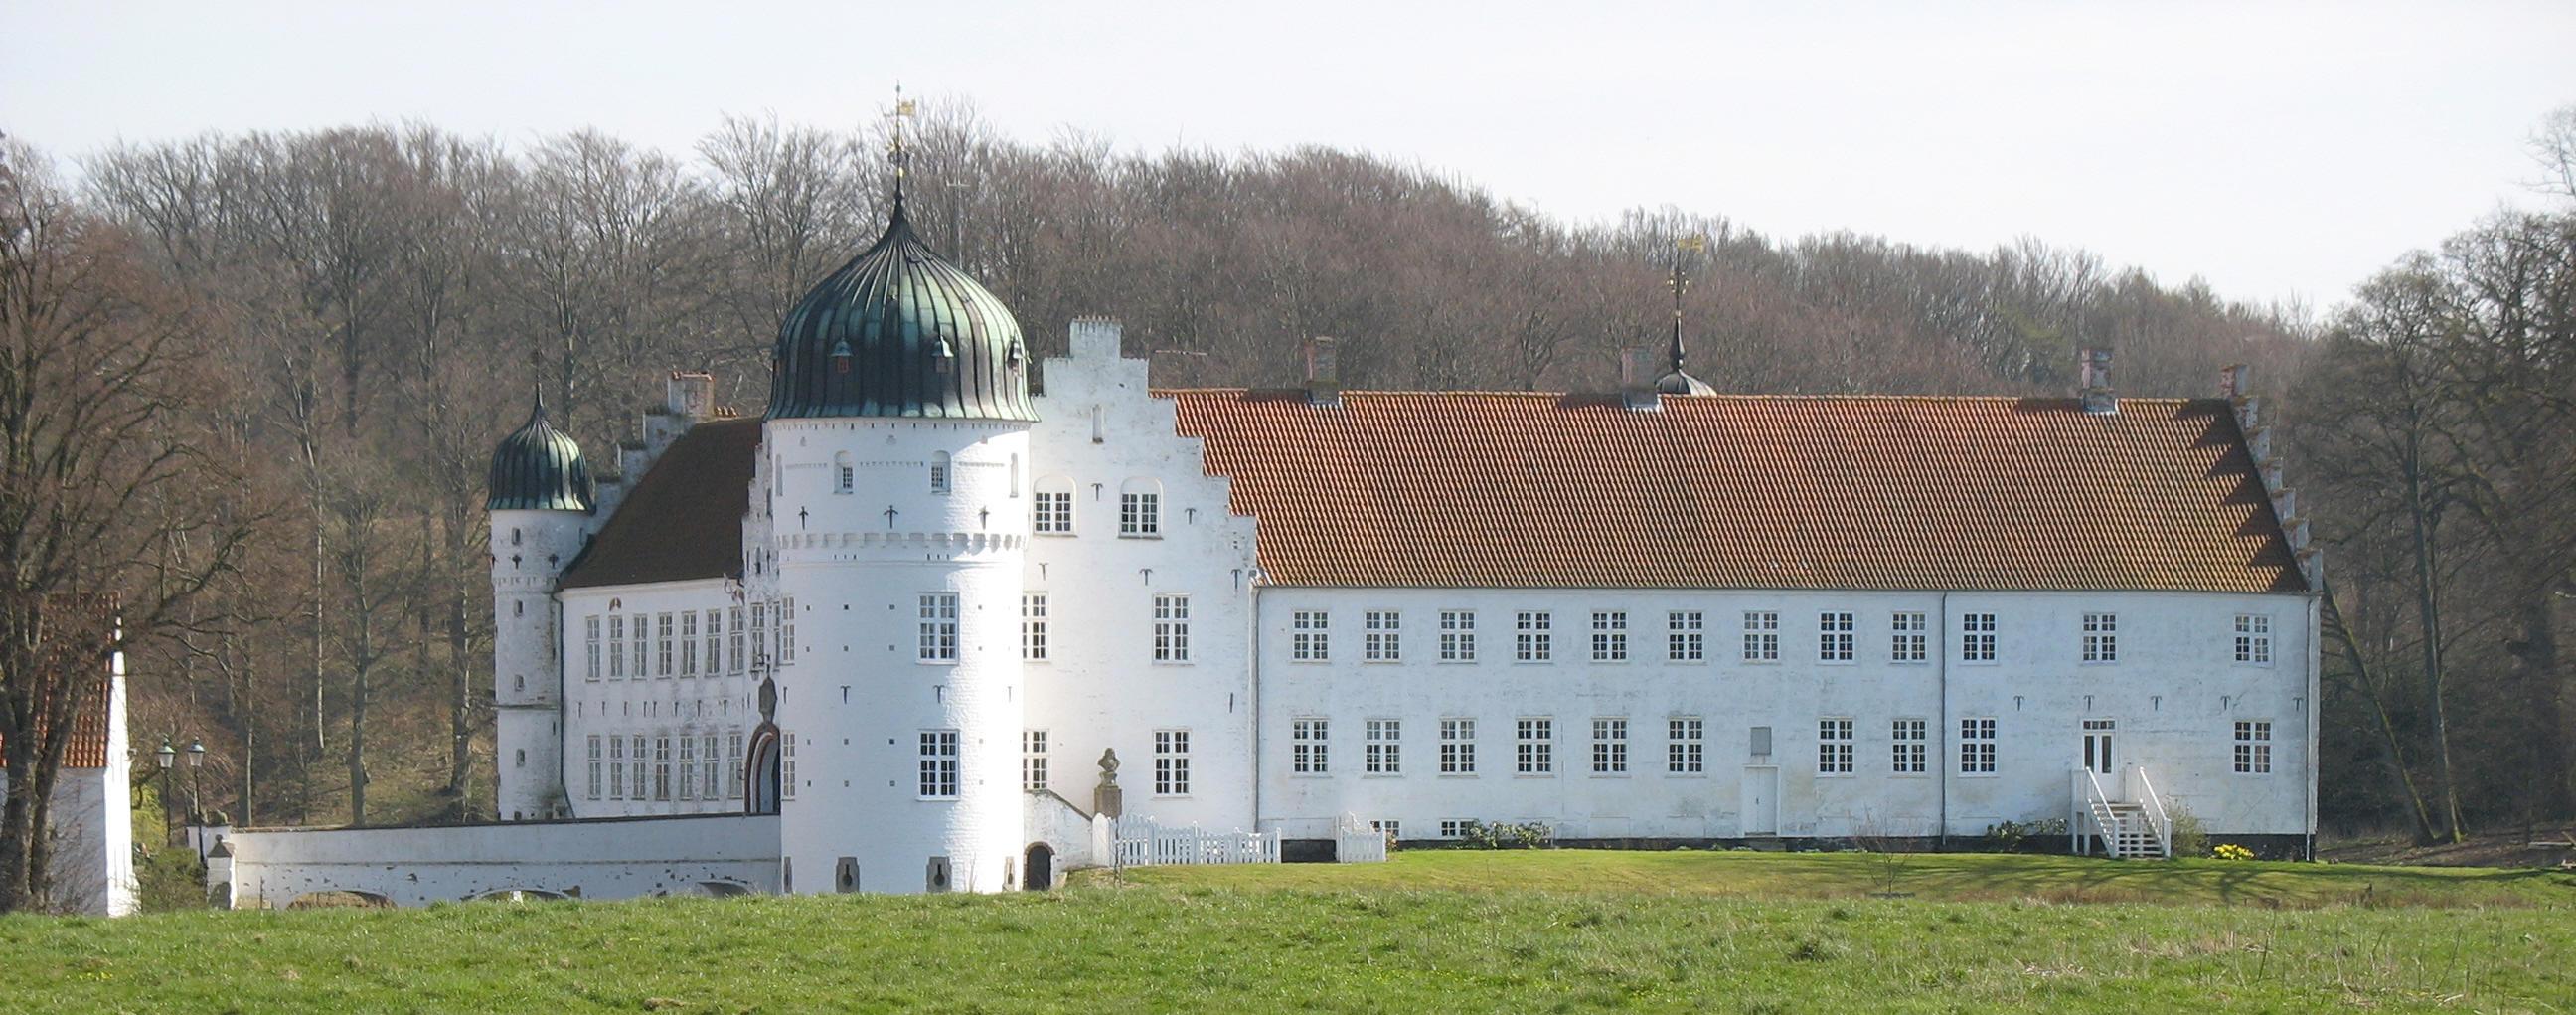 Torbenfeldt